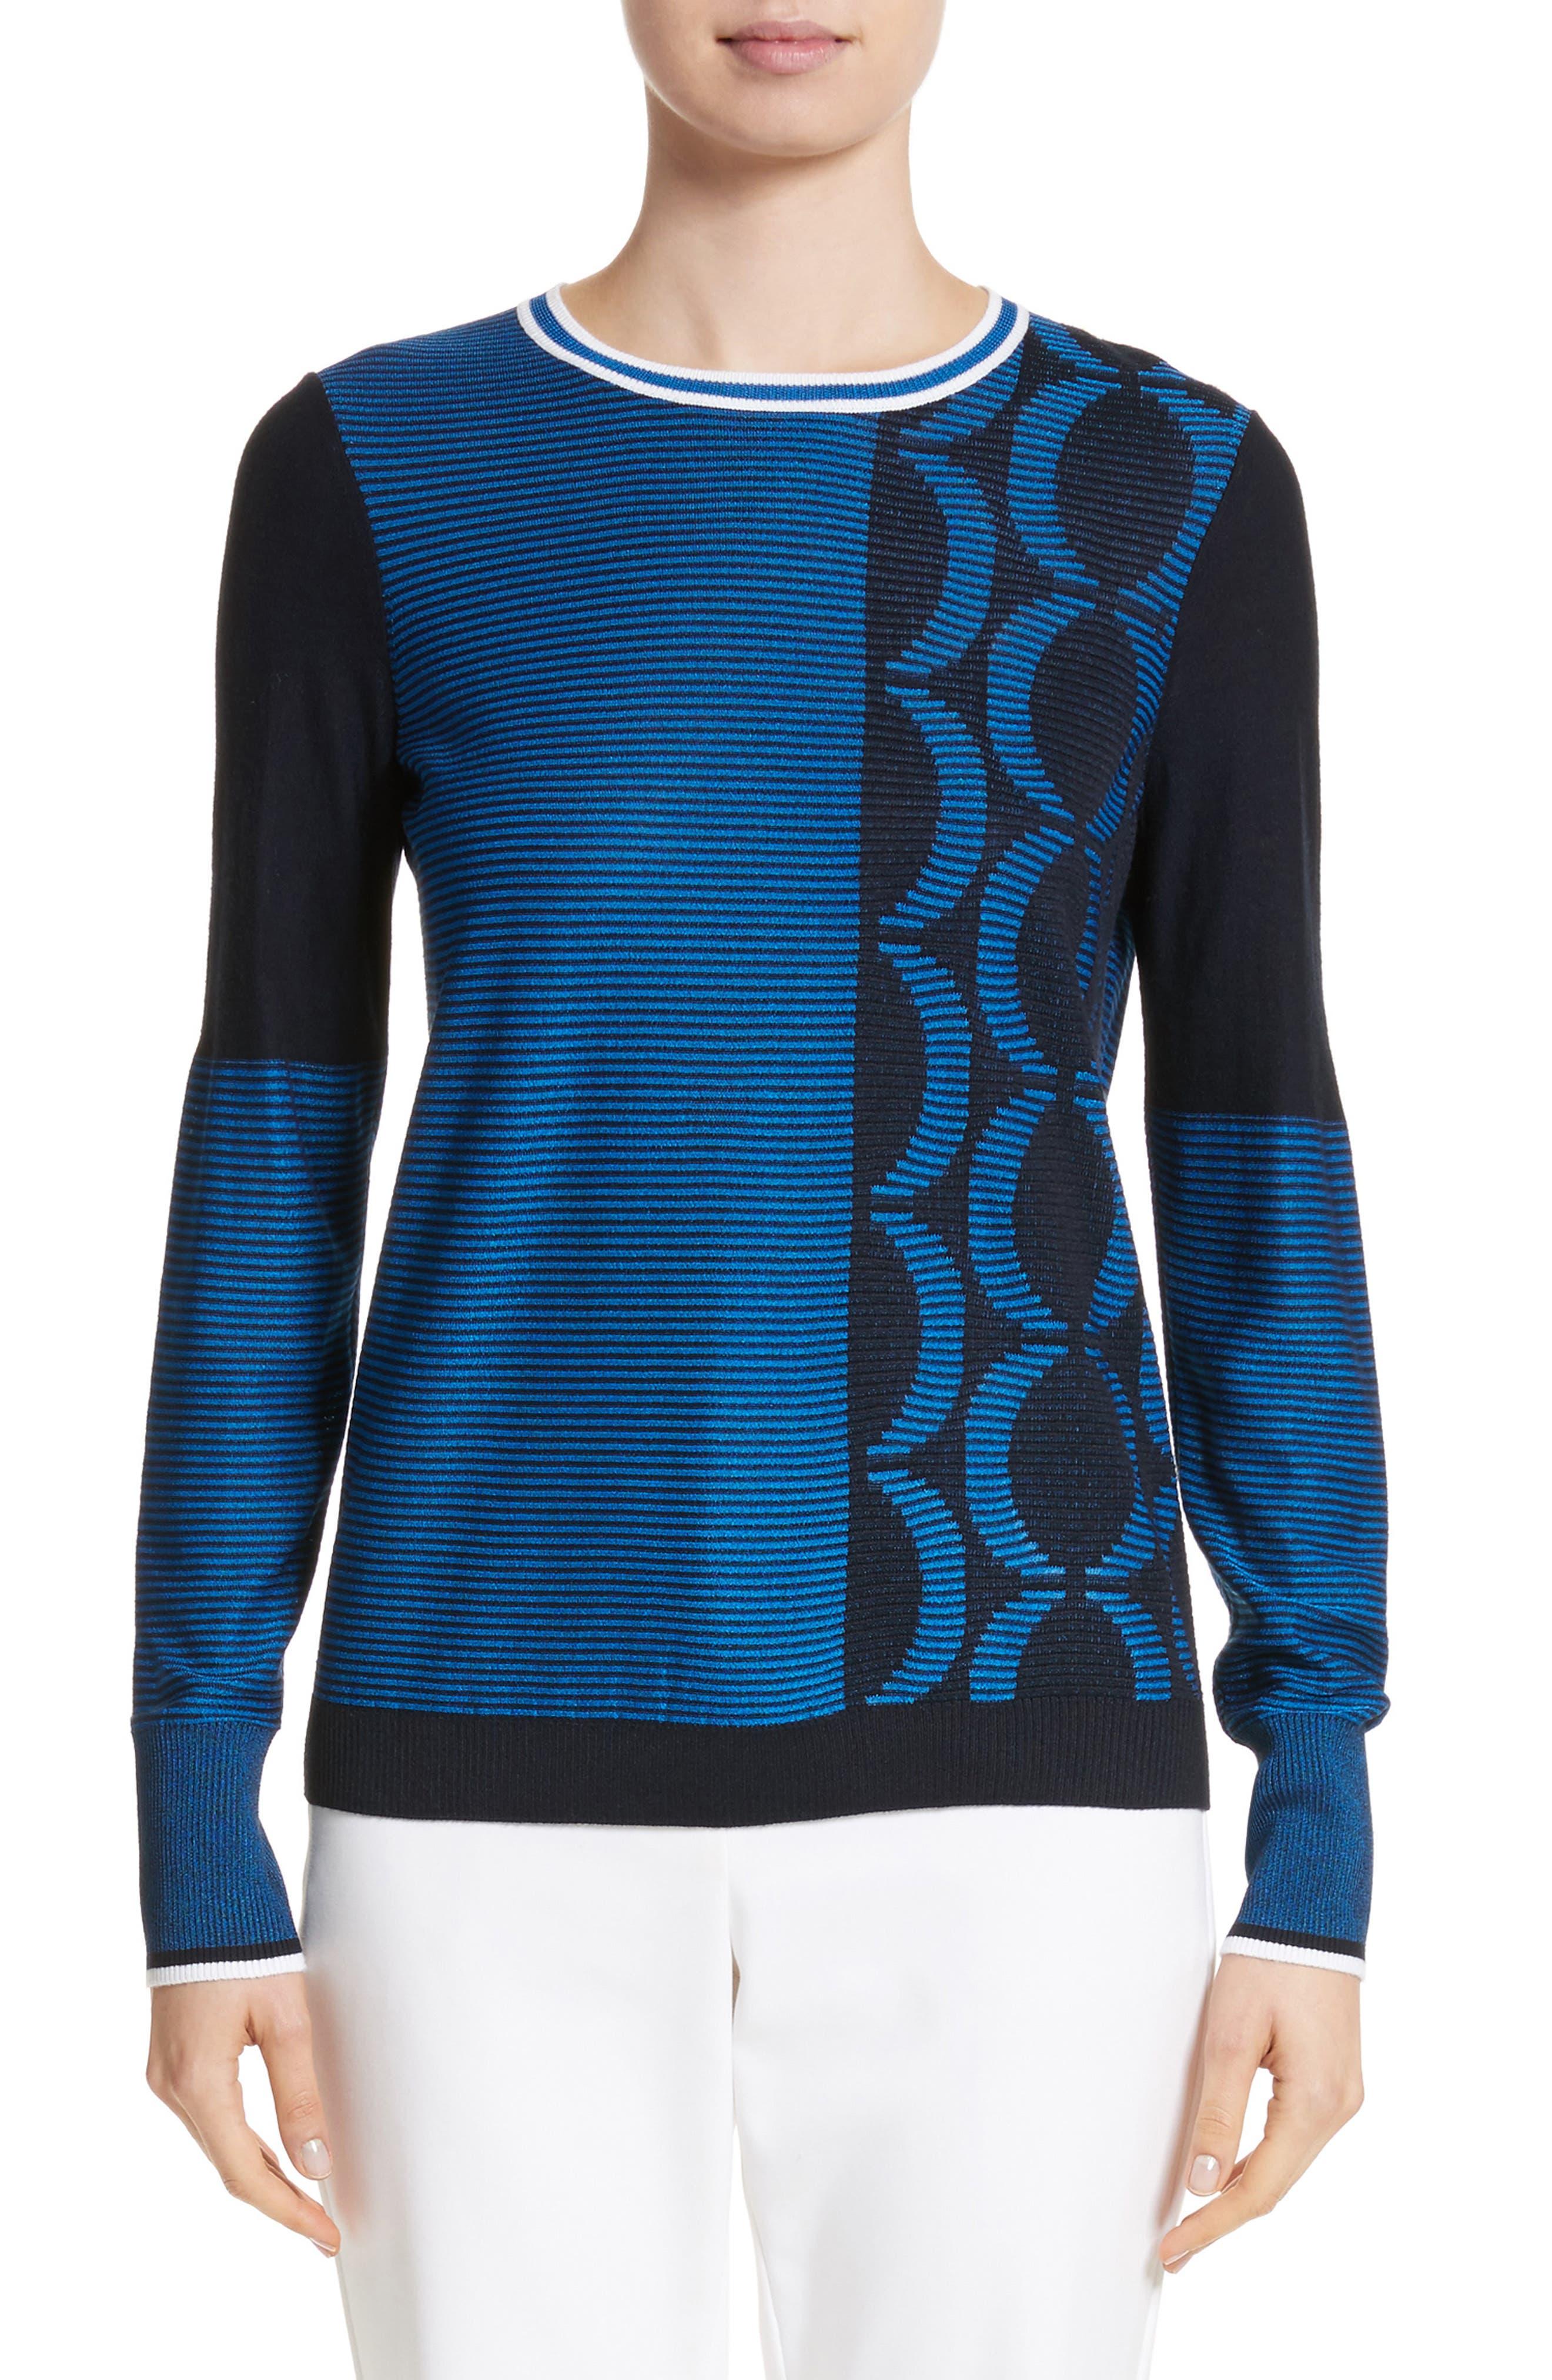 Jacquard Knit Sweater,                             Main thumbnail 1, color,                             Navy/ Niagara/ Bianco